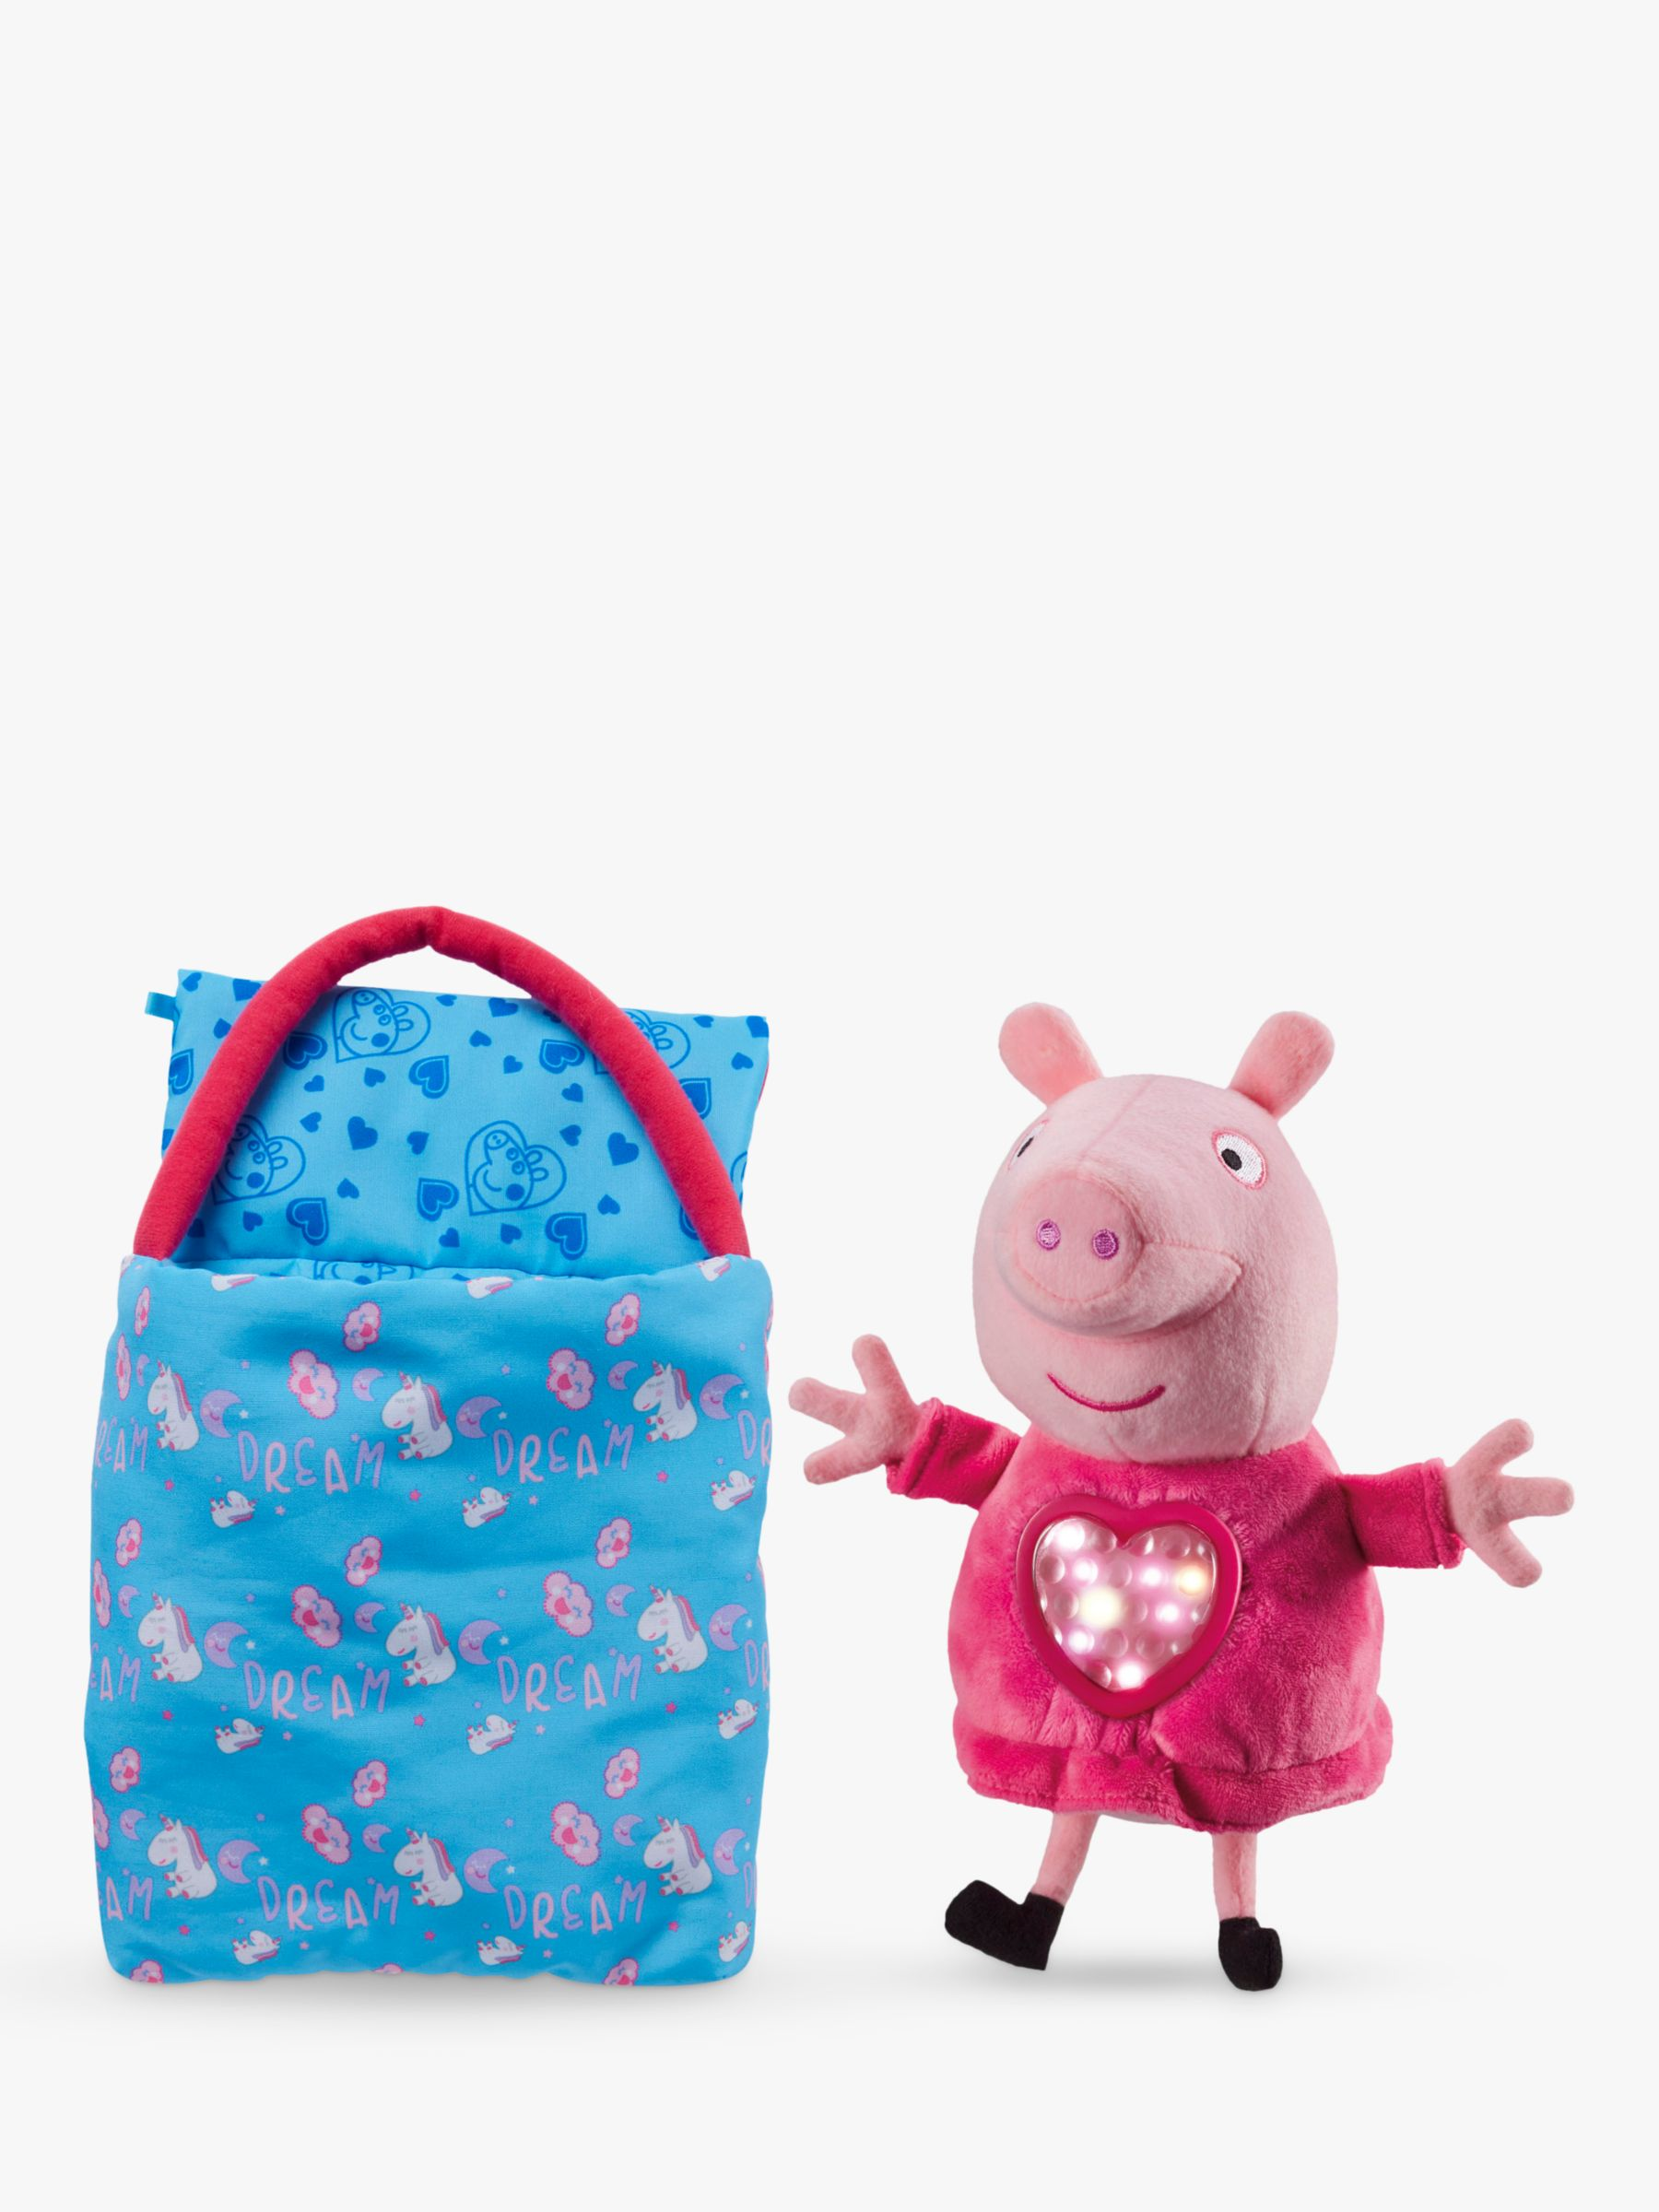 Peppa Pig Peppa Pig Sleepover Peppa Bedtime Companion